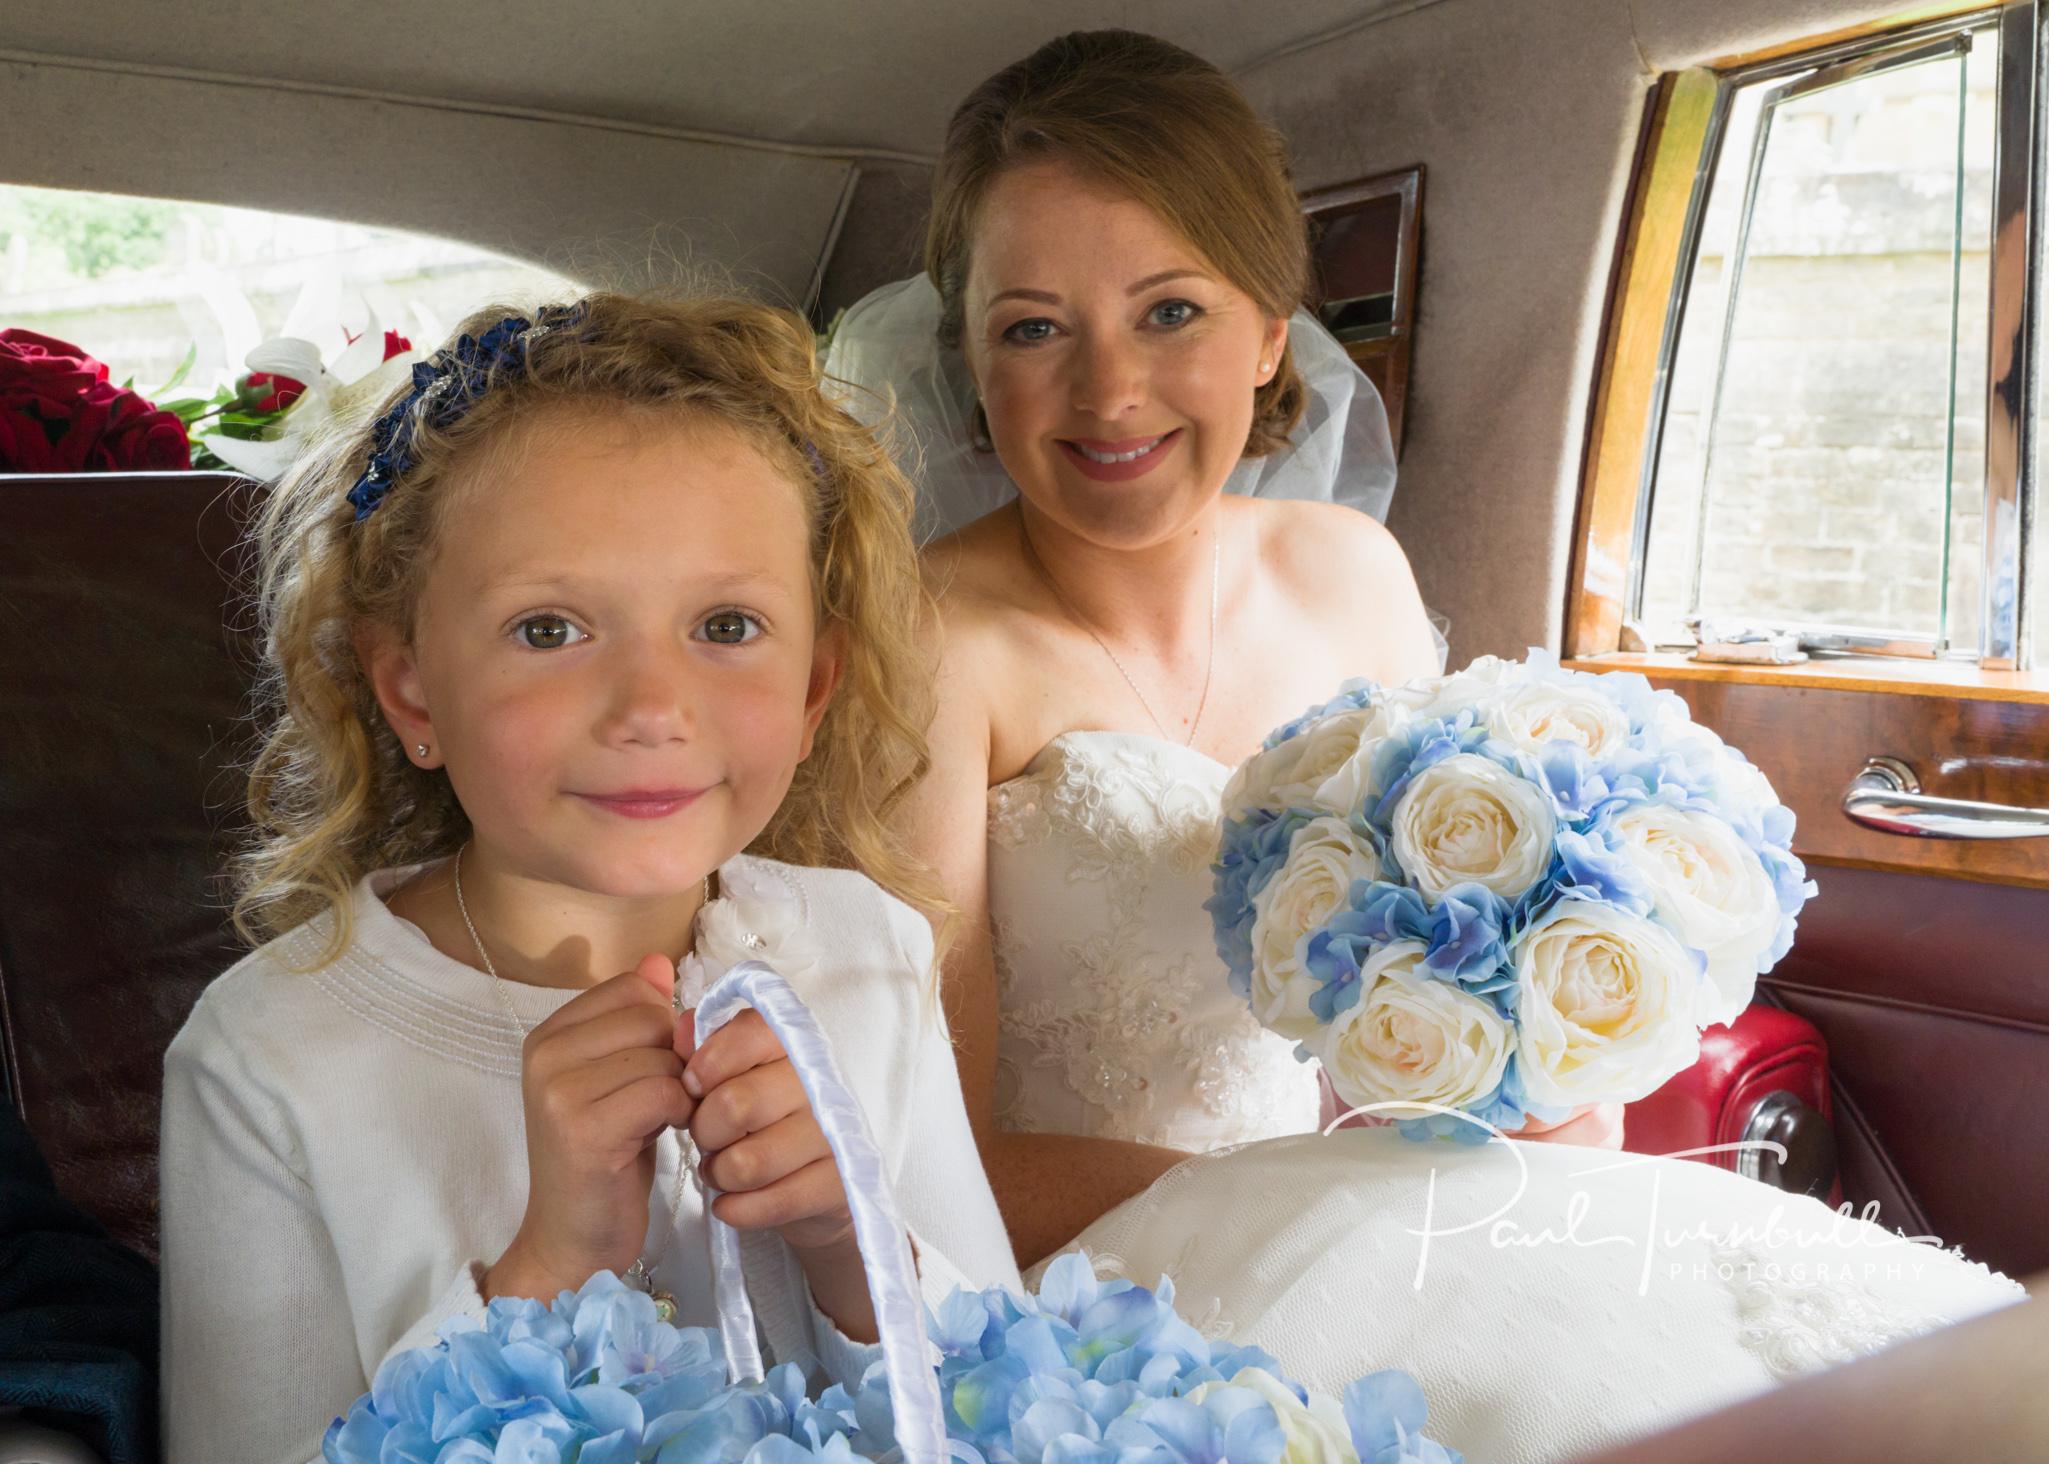 wedding-photographer-south-dalton-walkington-yorkshire-emma-james-028.jpg